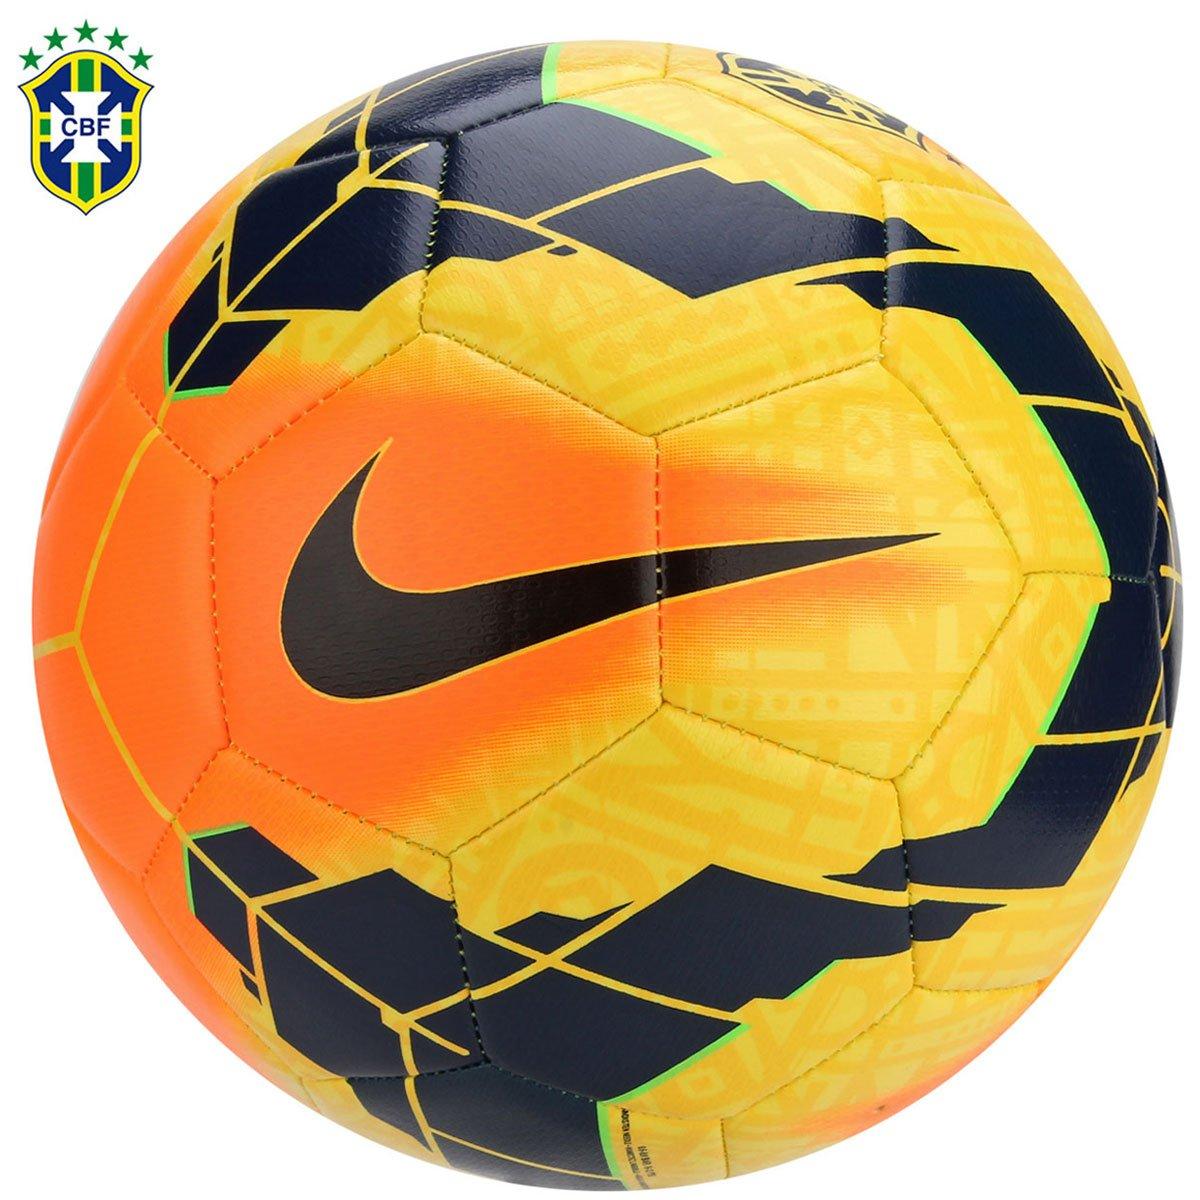 Bola Futebol Nike Strike CBF Campo - Compre Agora  1f4658df4bd63